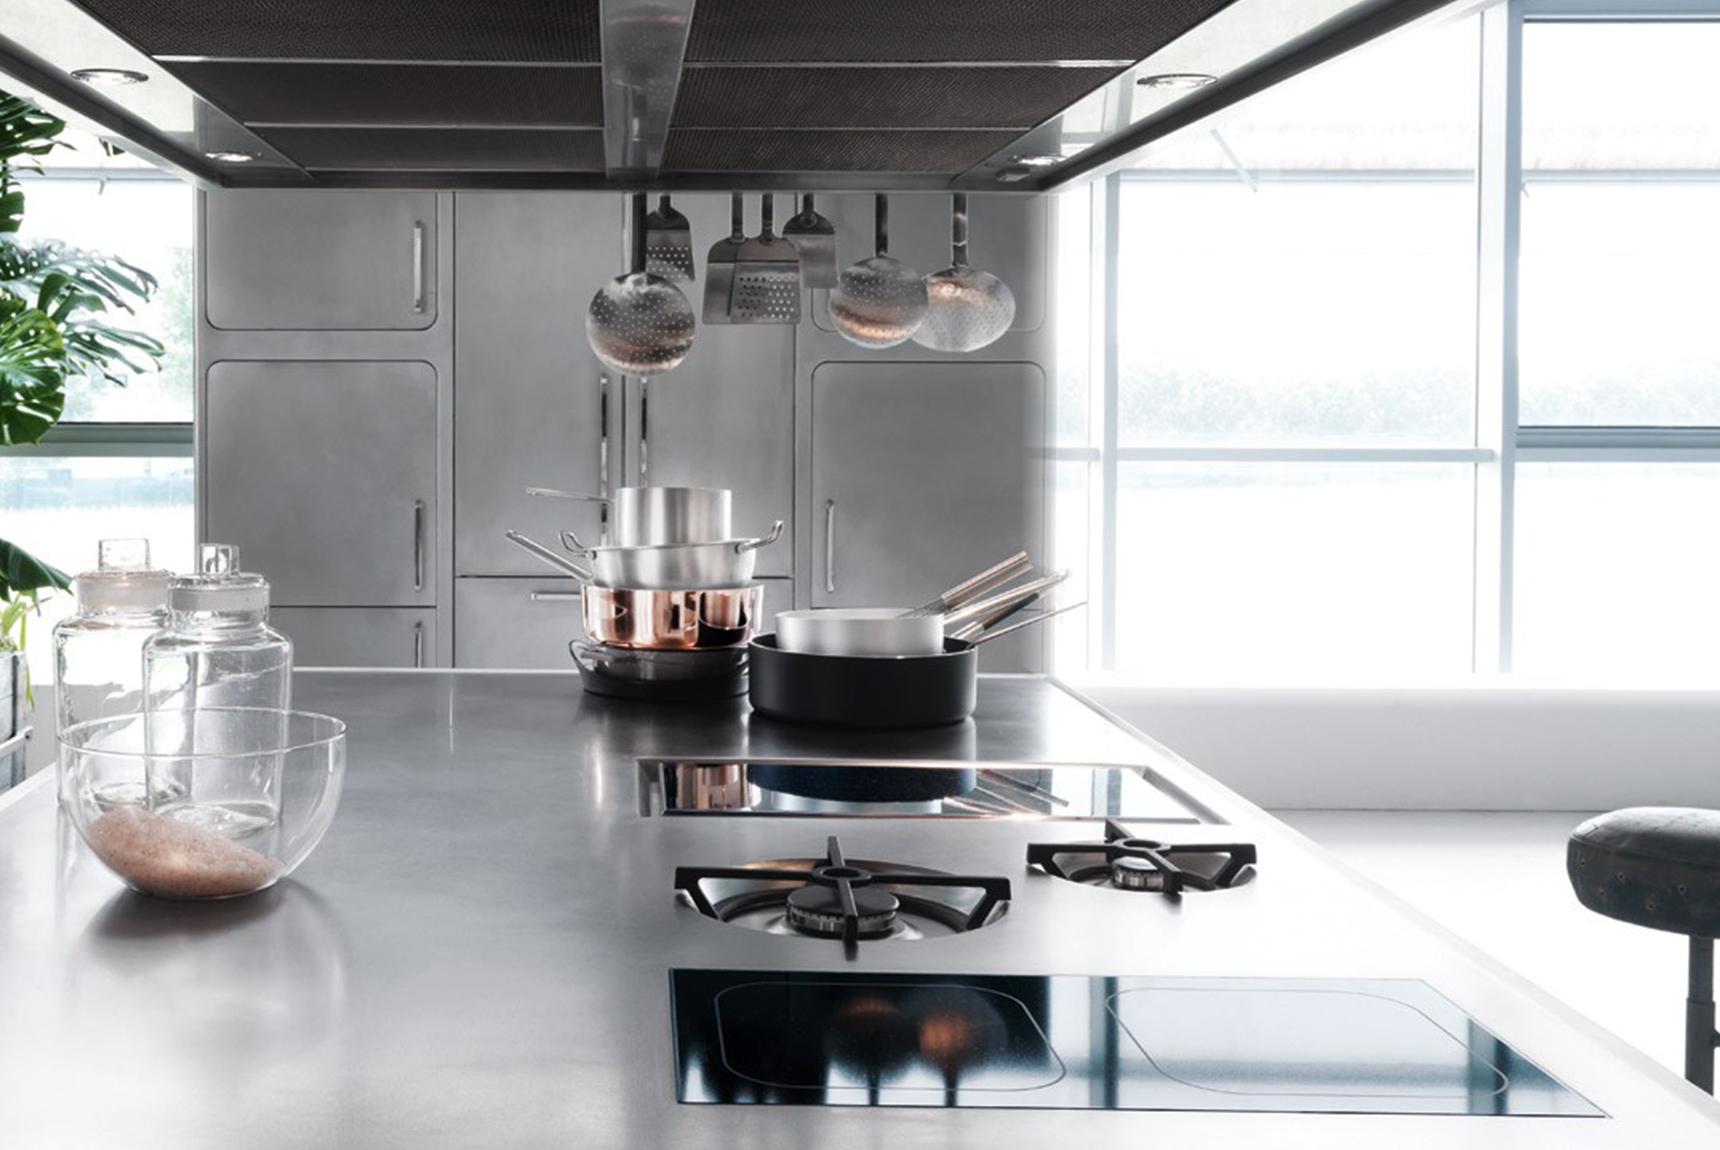 Come avere una cucina professionale a casa? Cucinepadova.com